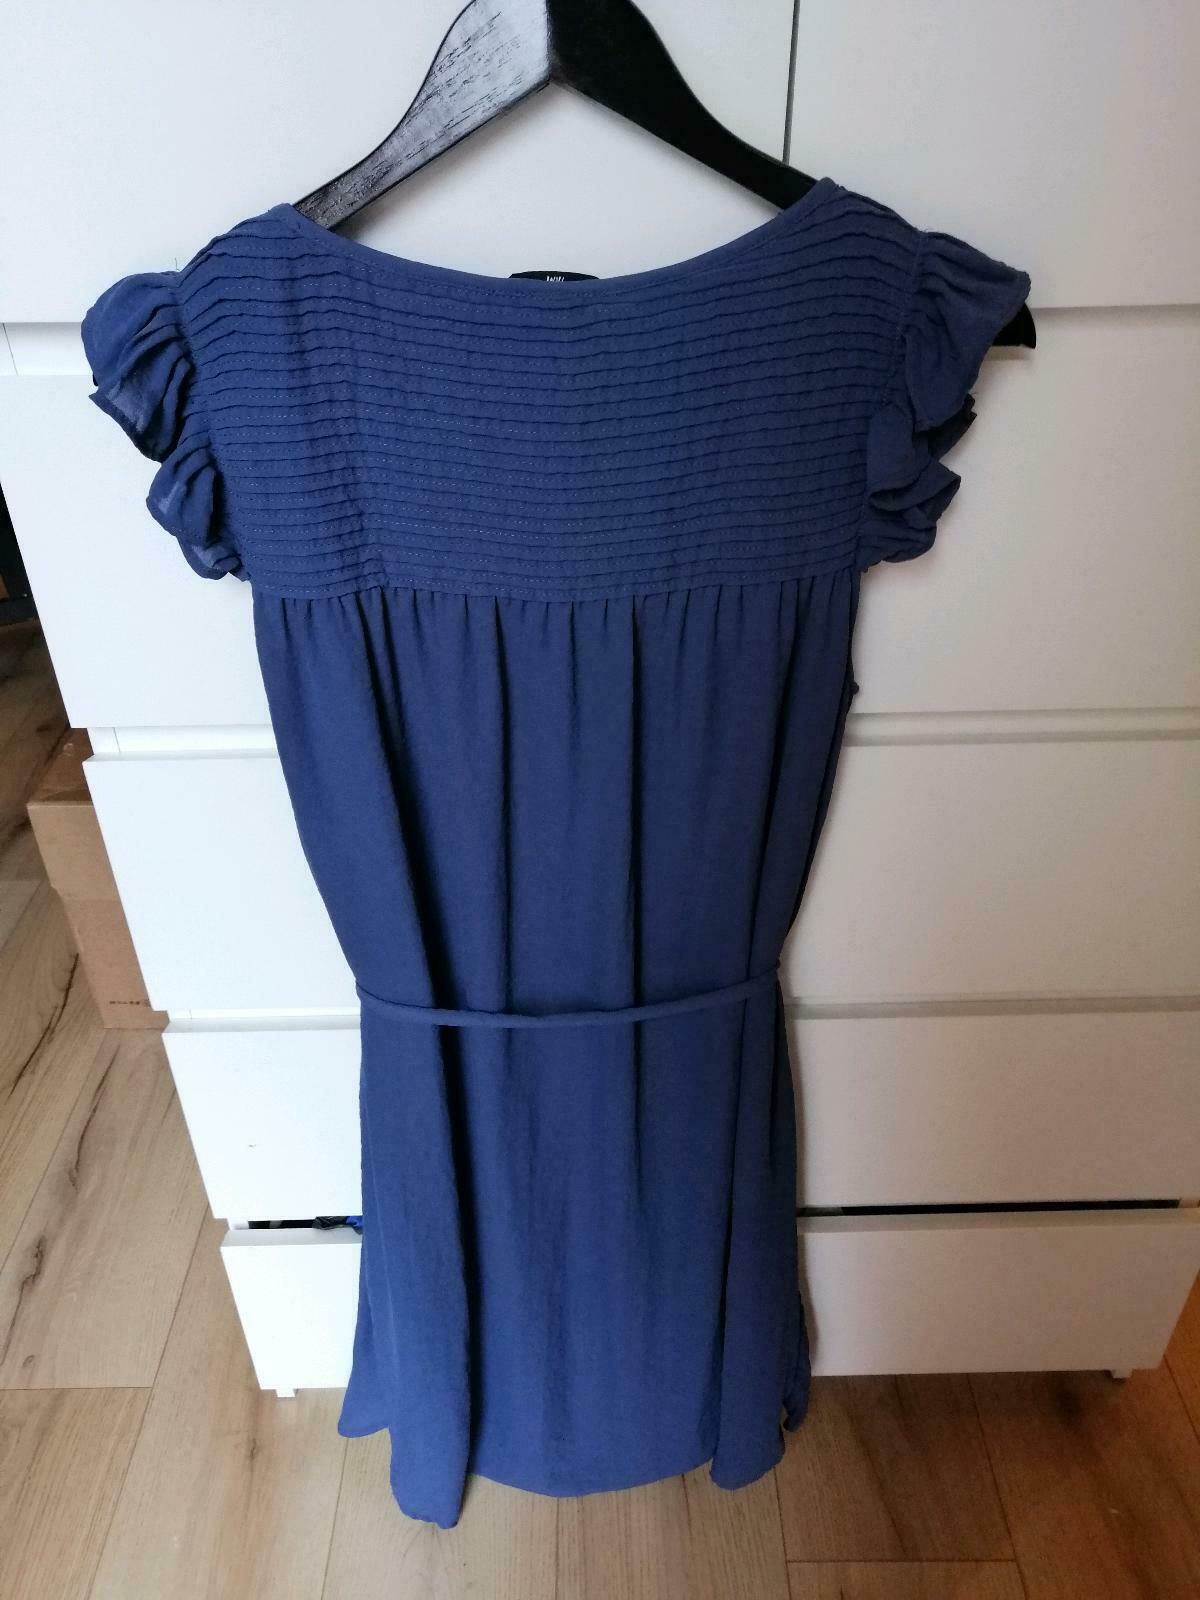 Hm Süßes Chiffon Kleid Tunika Taubenblau Rüschen Gr 44